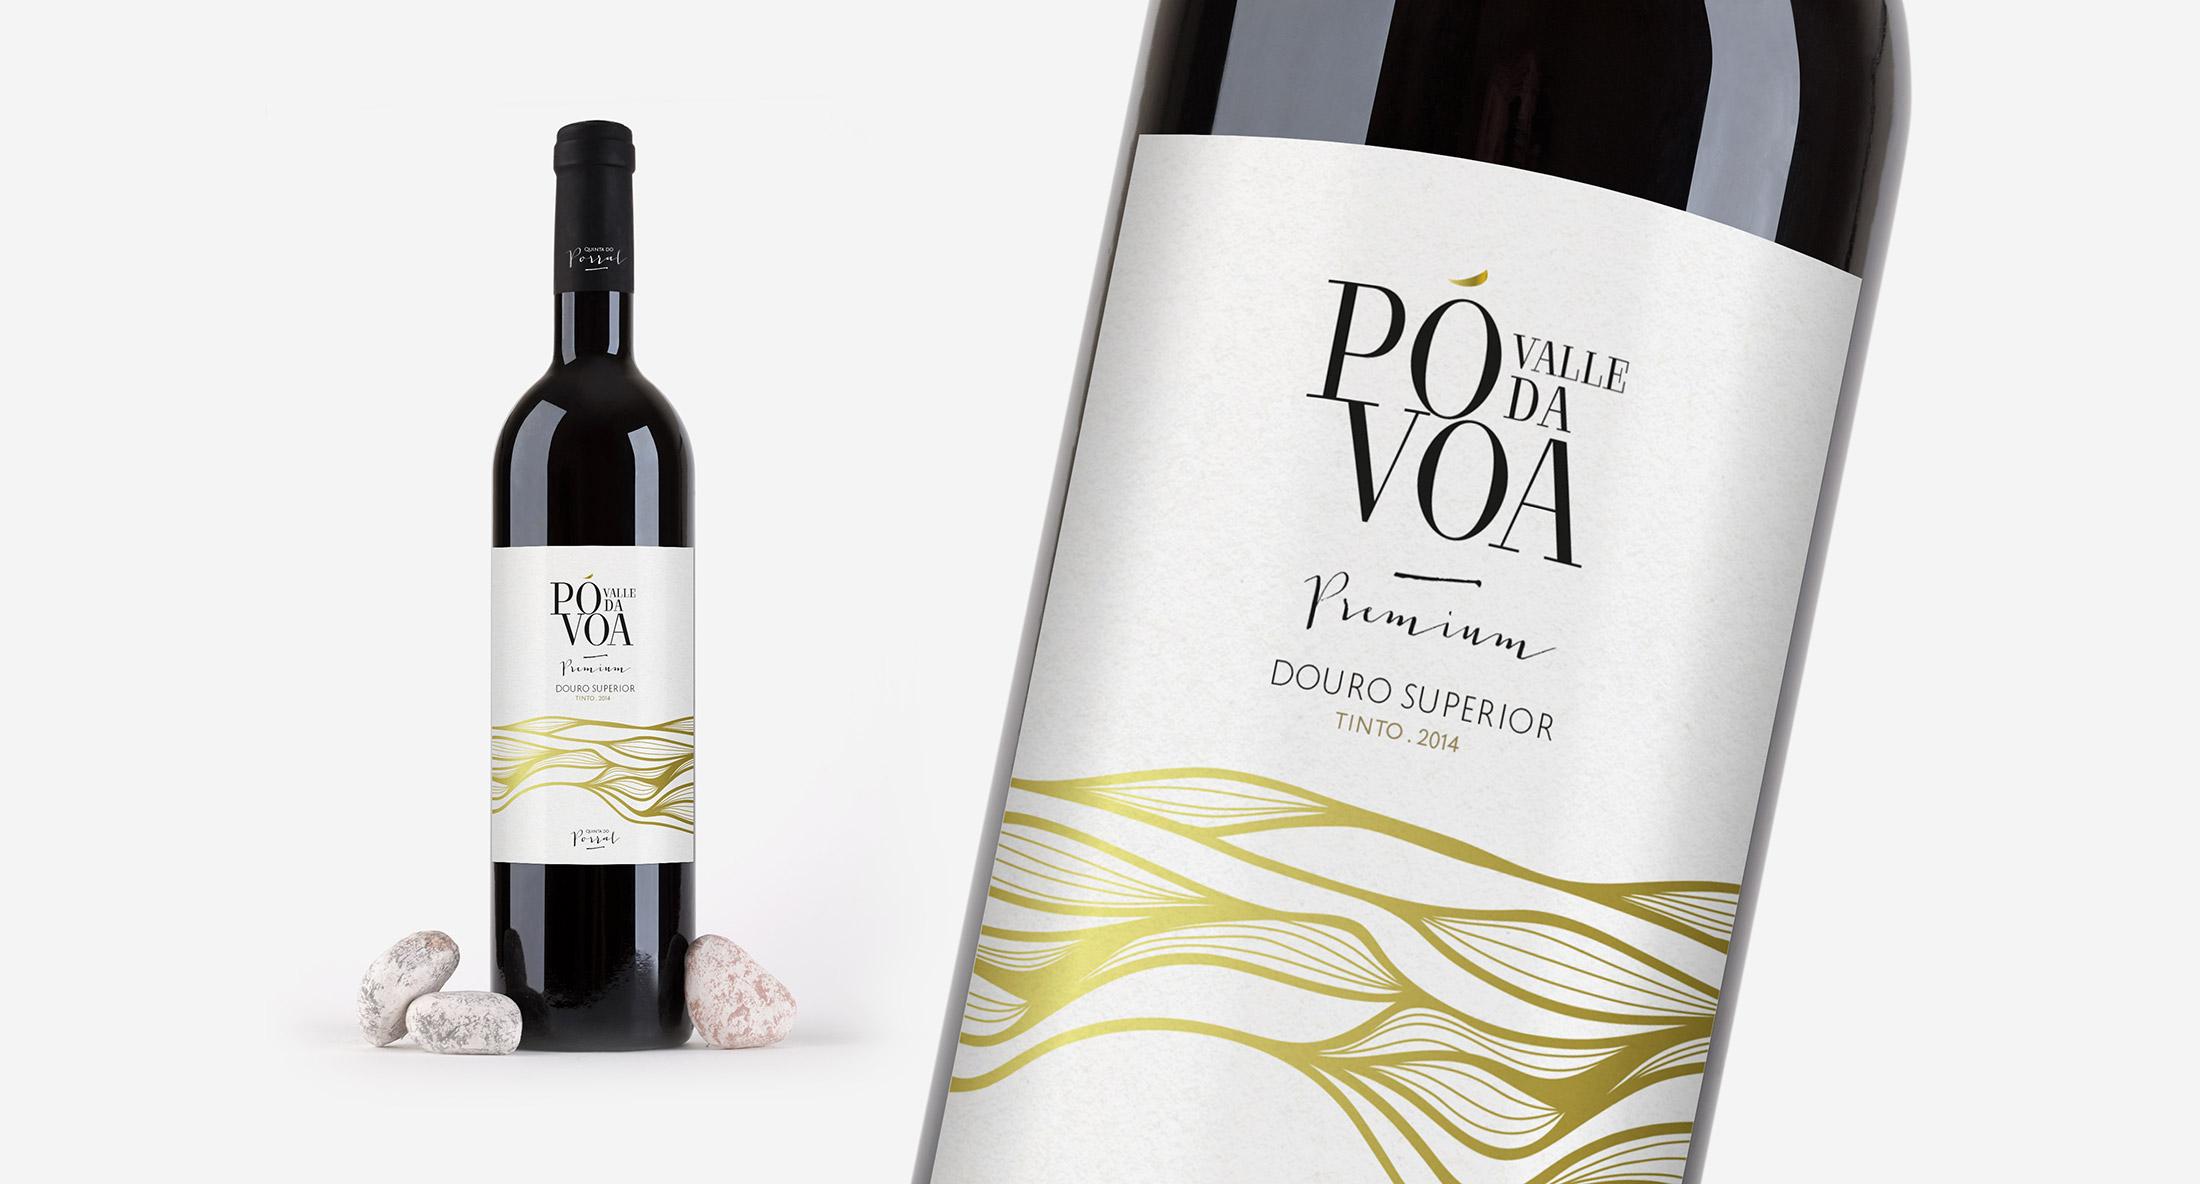 Rótulo garrafa de Vinho Valle da Póvoa